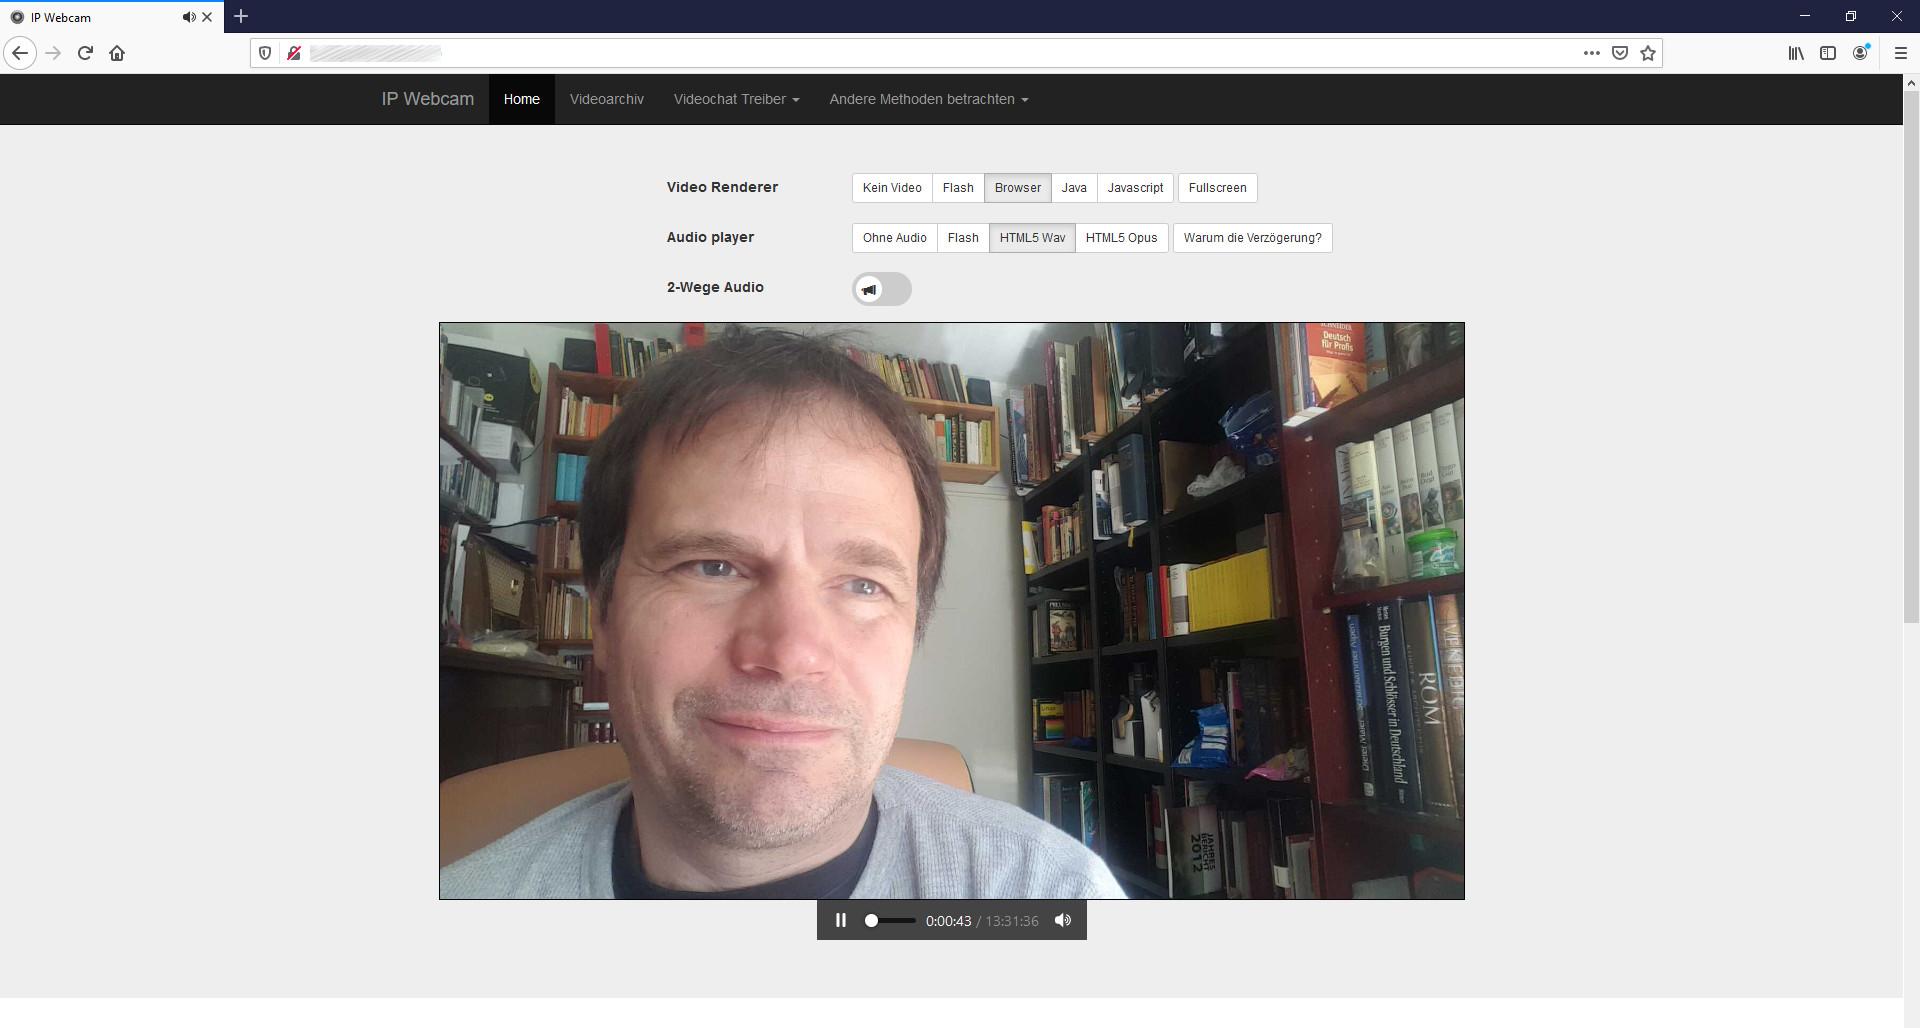 Screenshot 1 - IP Webcam (Android-App)